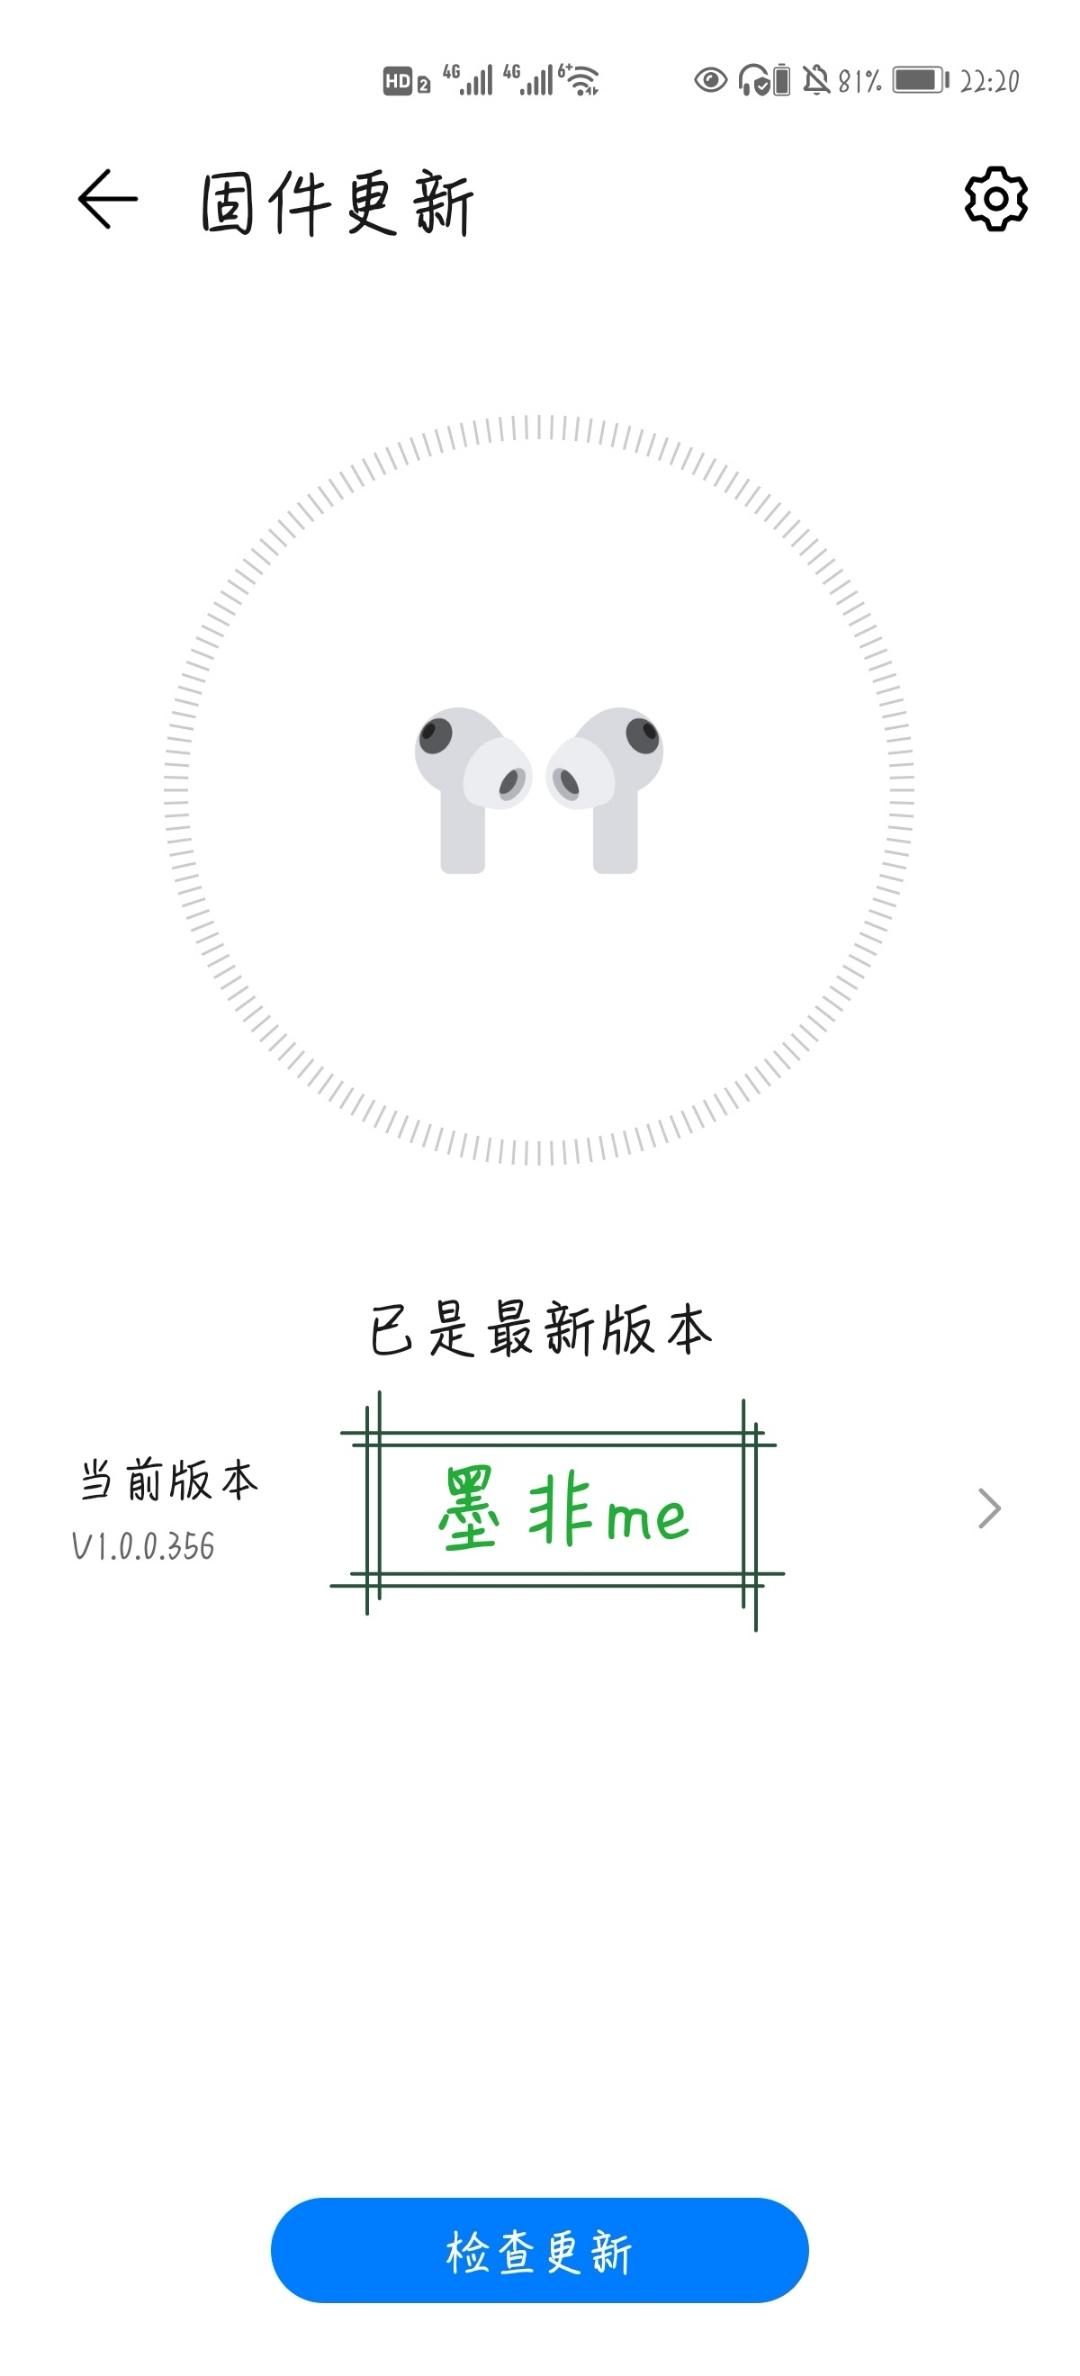 Screenshot_20210407_222027_com.huawei.smarthome_edit_348987530601435.jpg